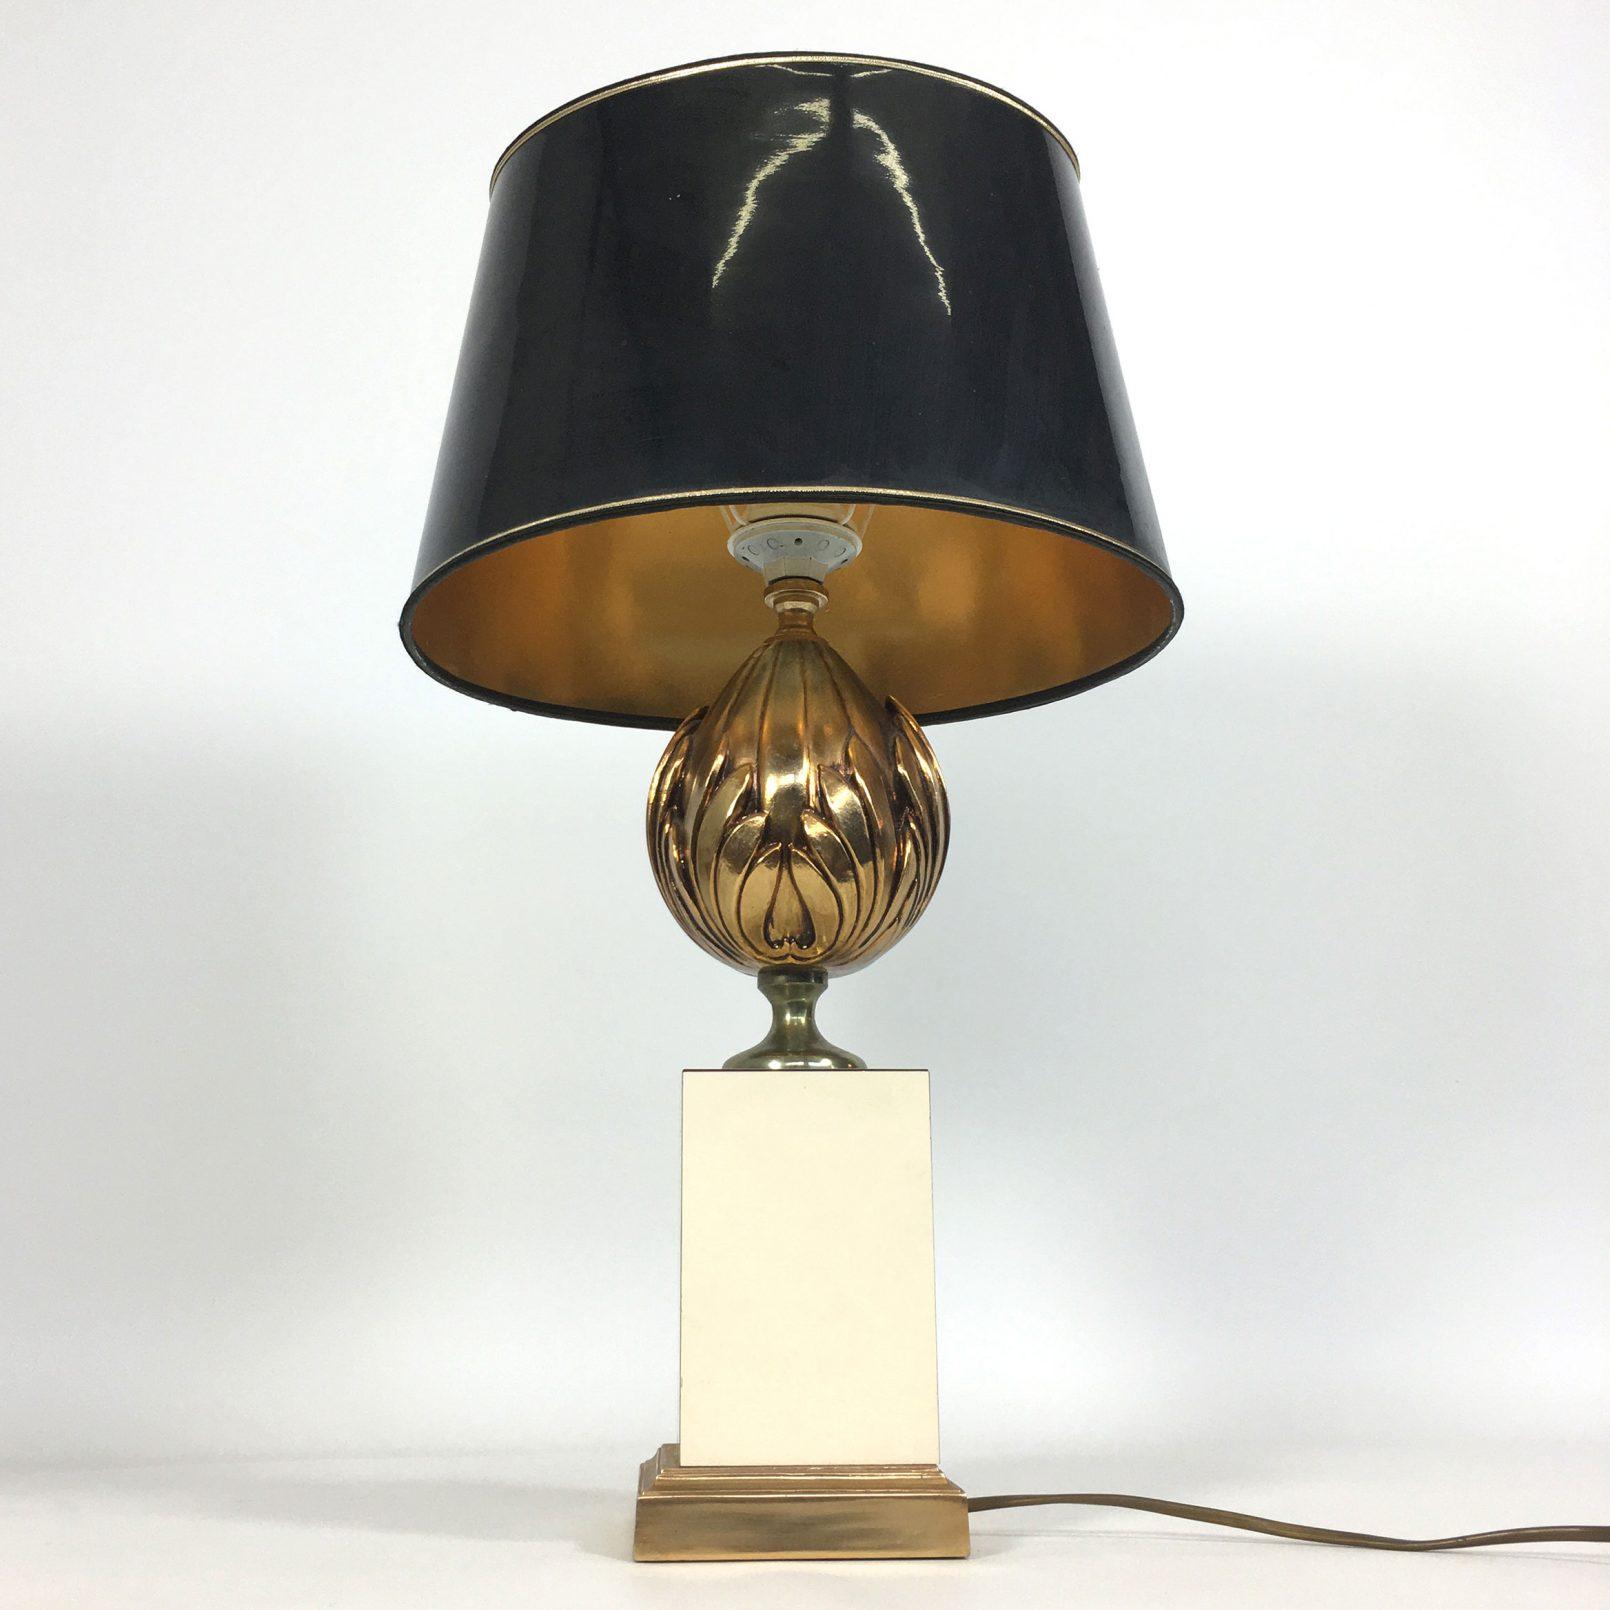 Lampe Diderot des années 80.